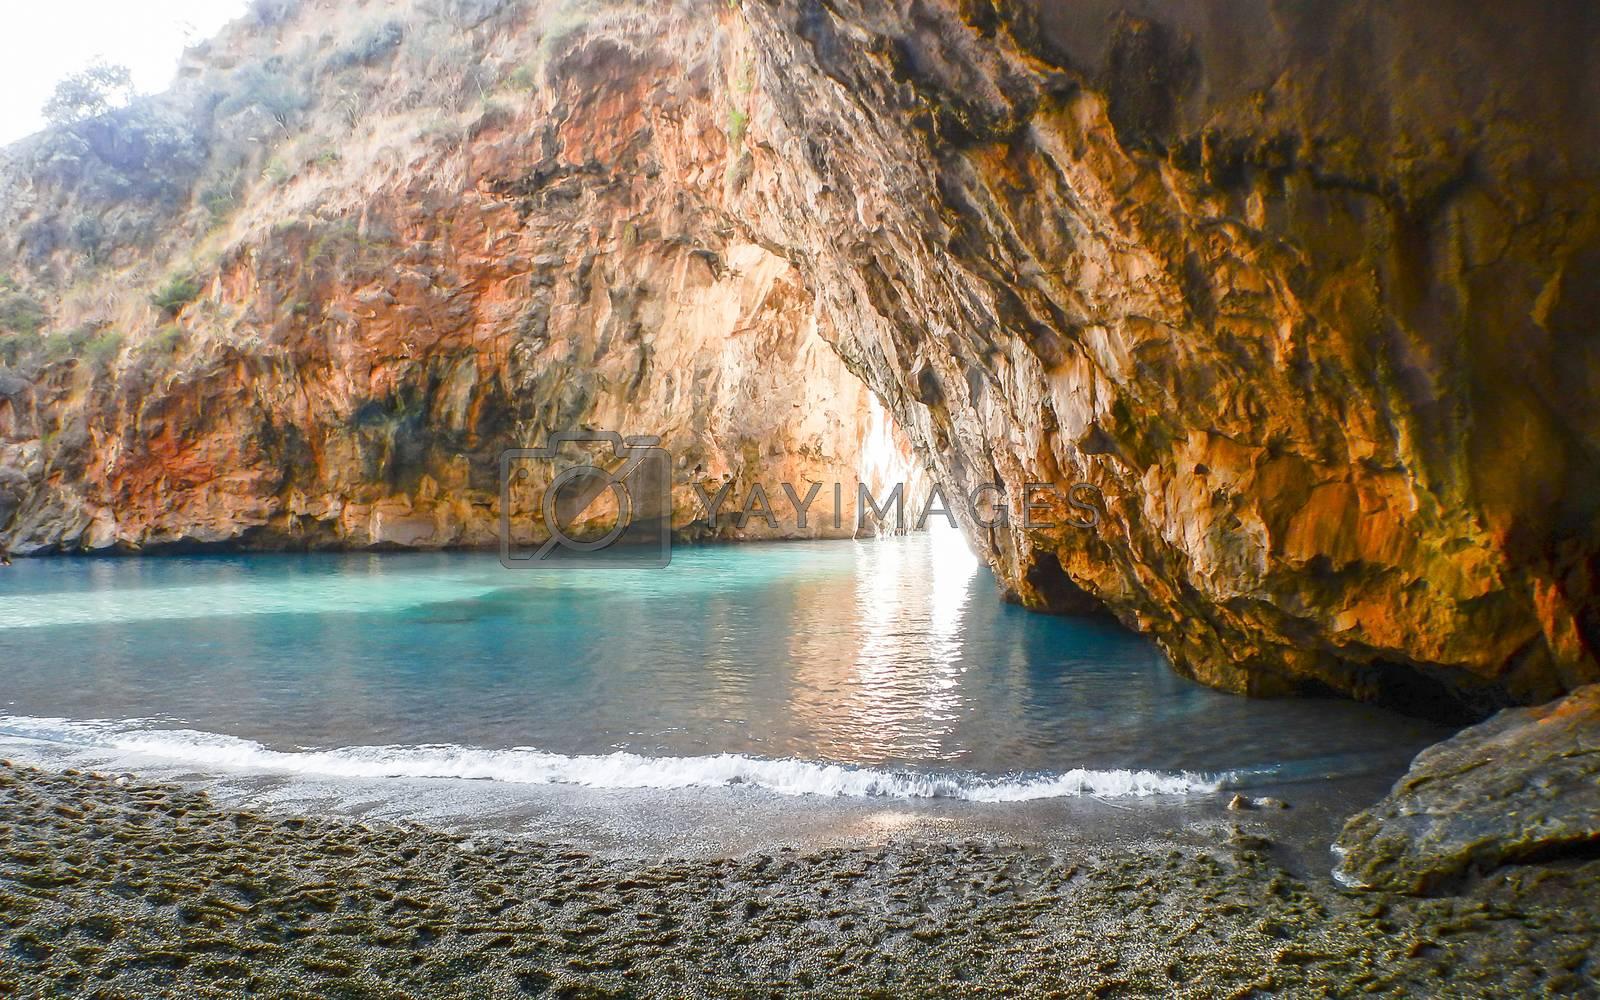 Arcomagno beach, Coast of the Cedars, Tyrrhenian Sea, Italy by Marco Rubino